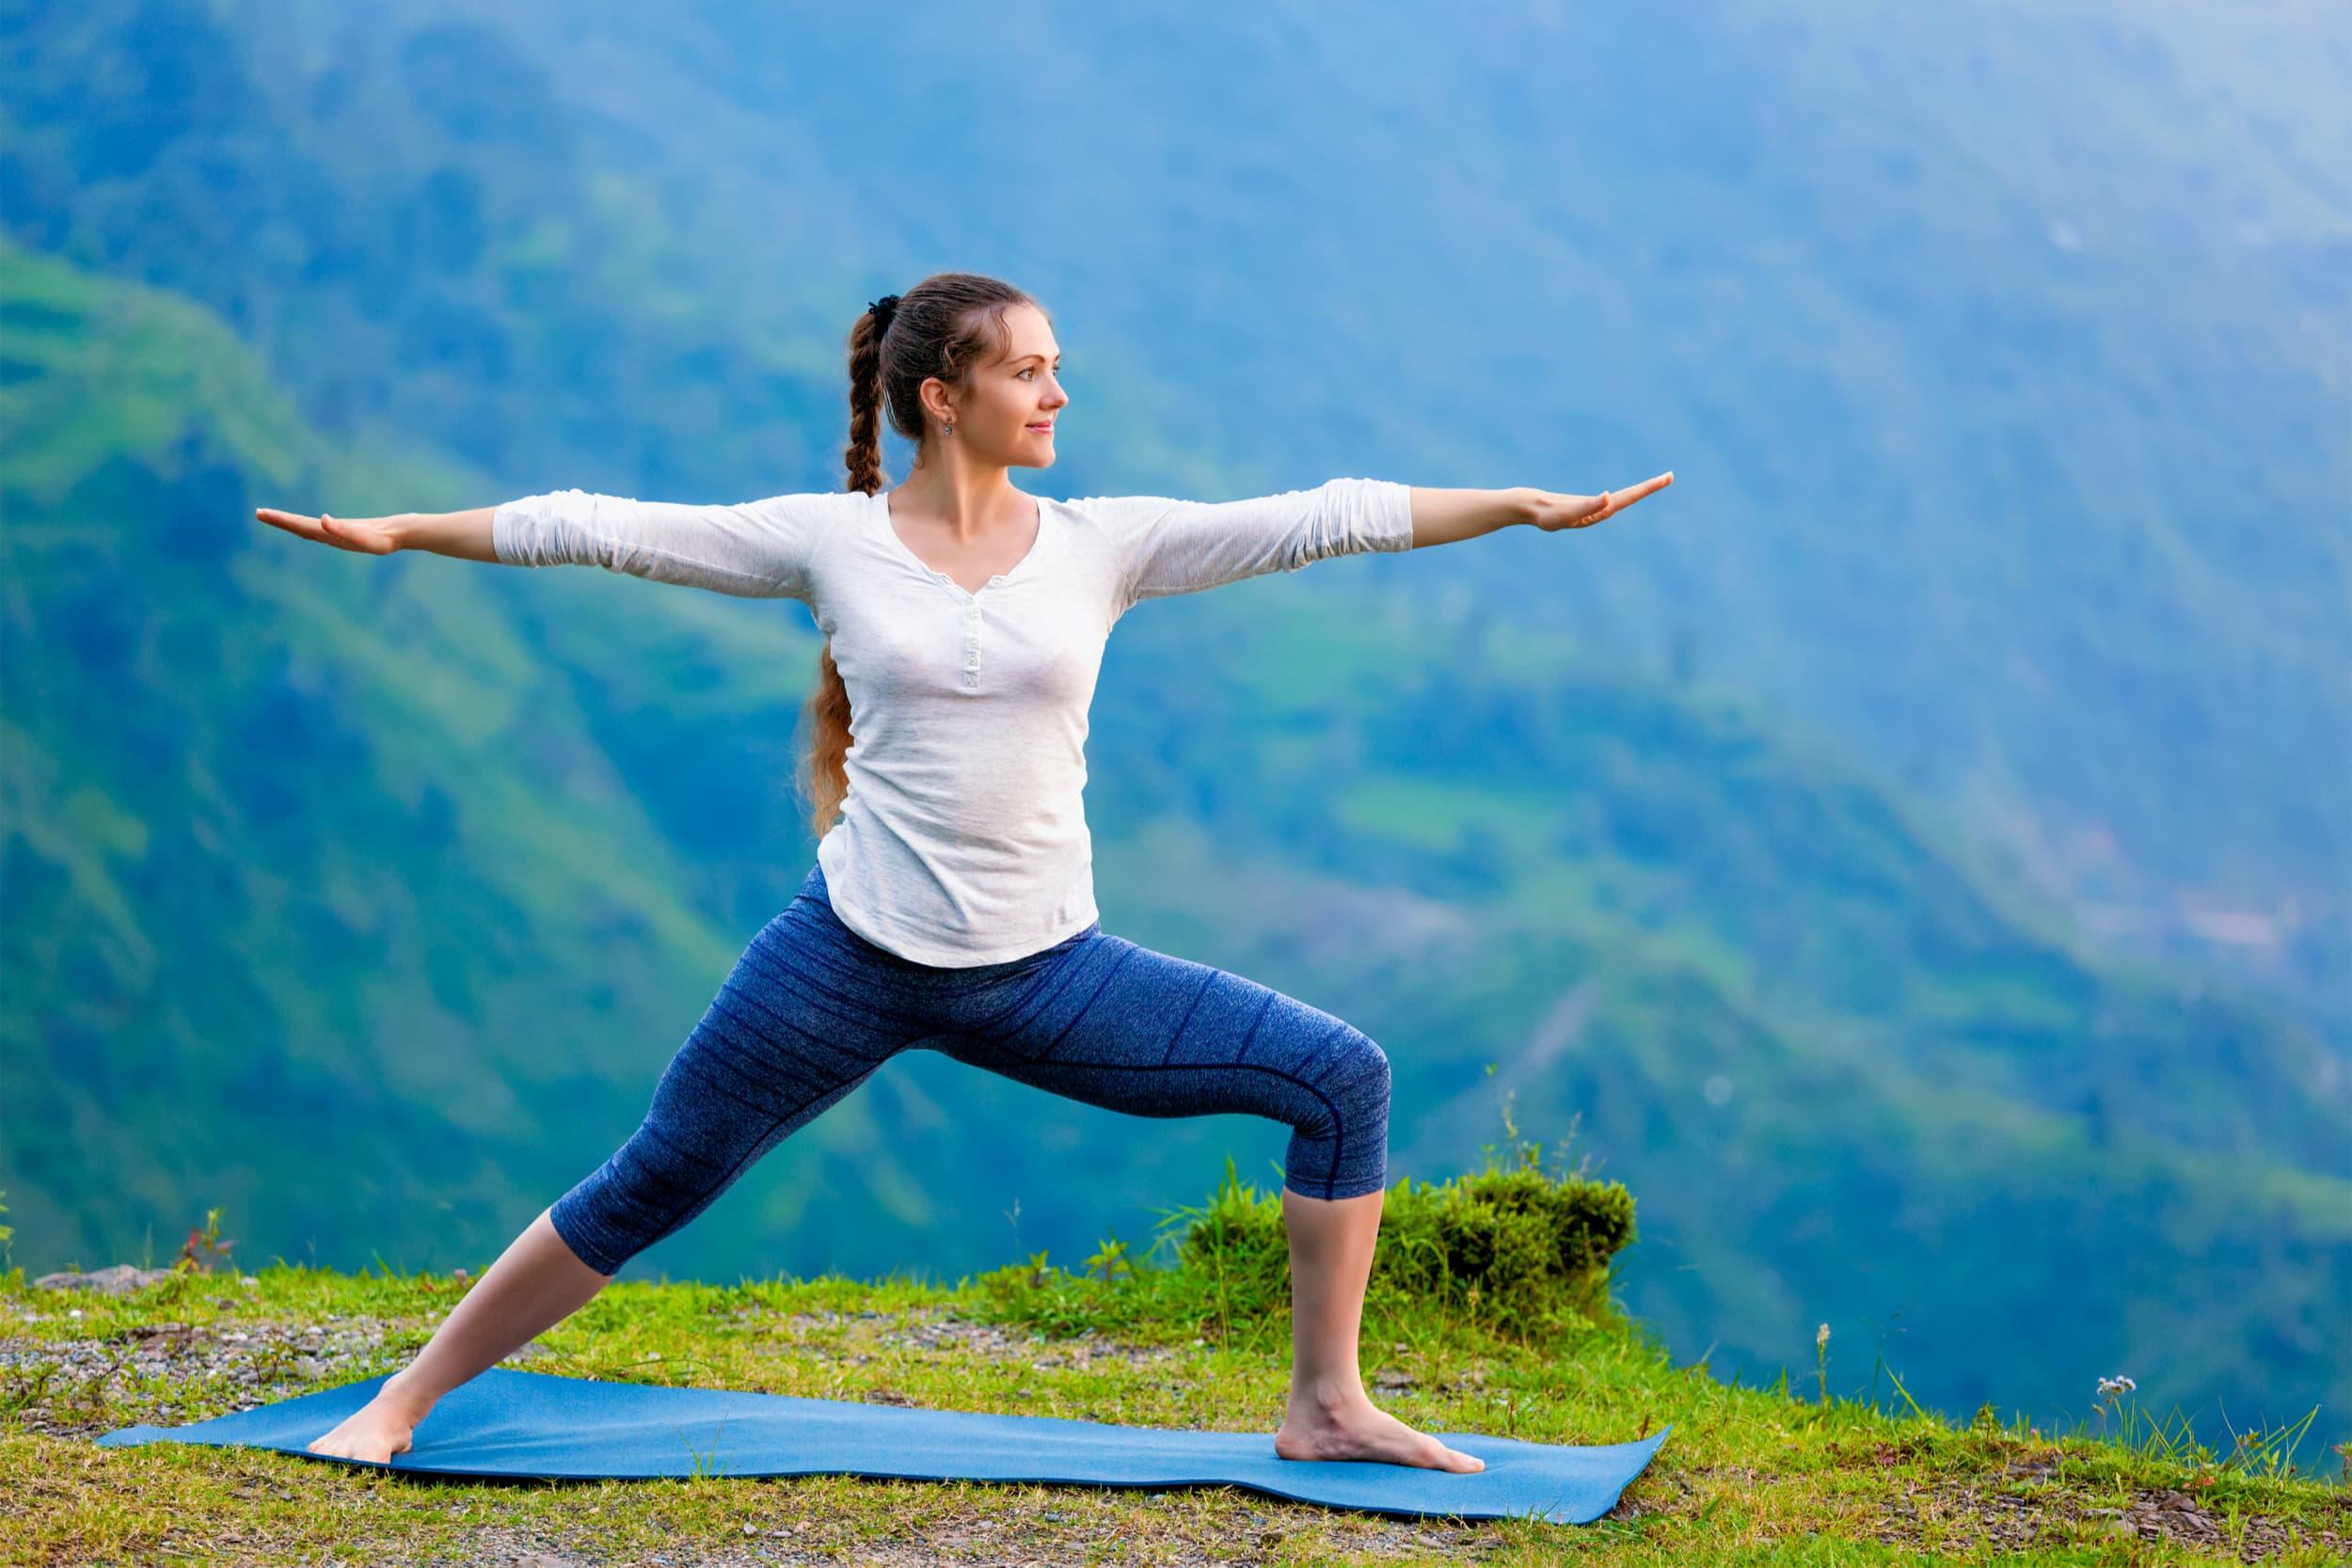 woman doing vinyasa yoga pose in the mountains